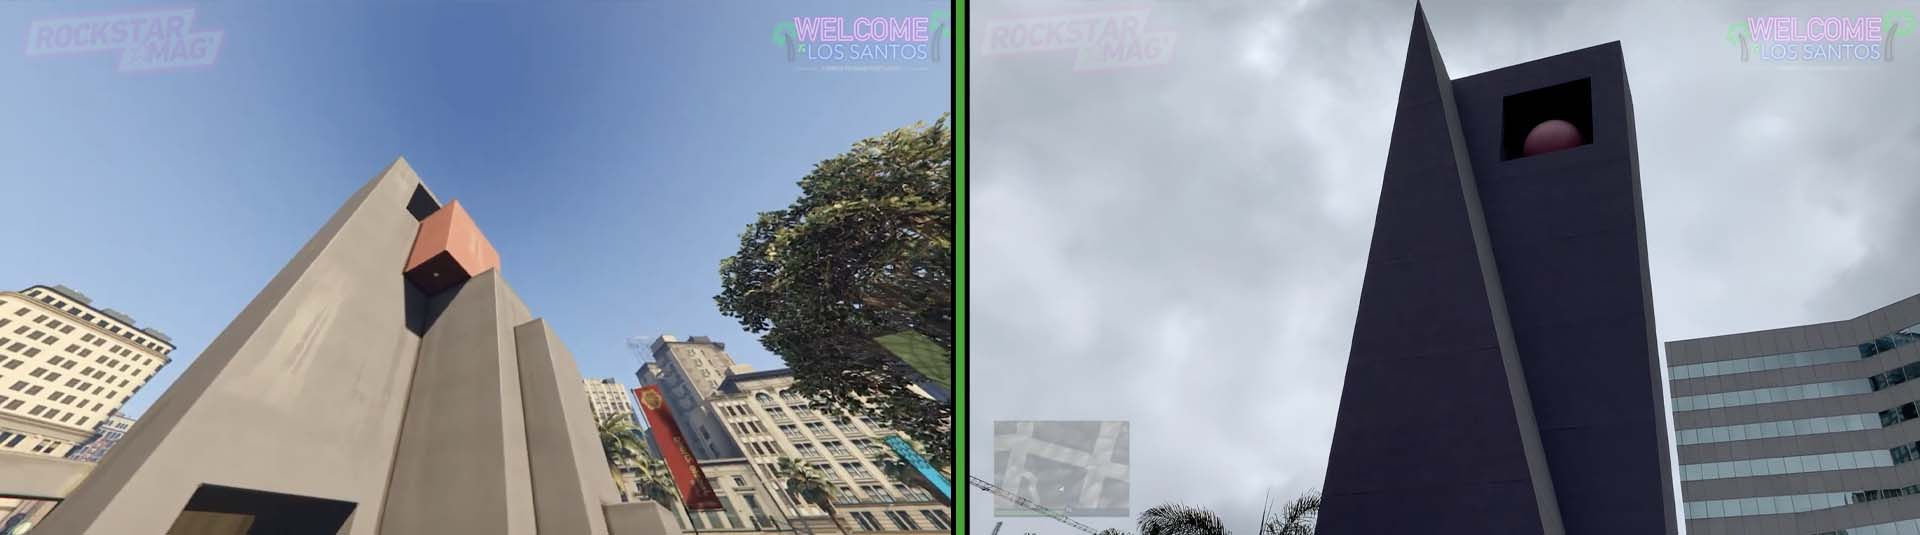 Downtown 02 : Legion Square 02